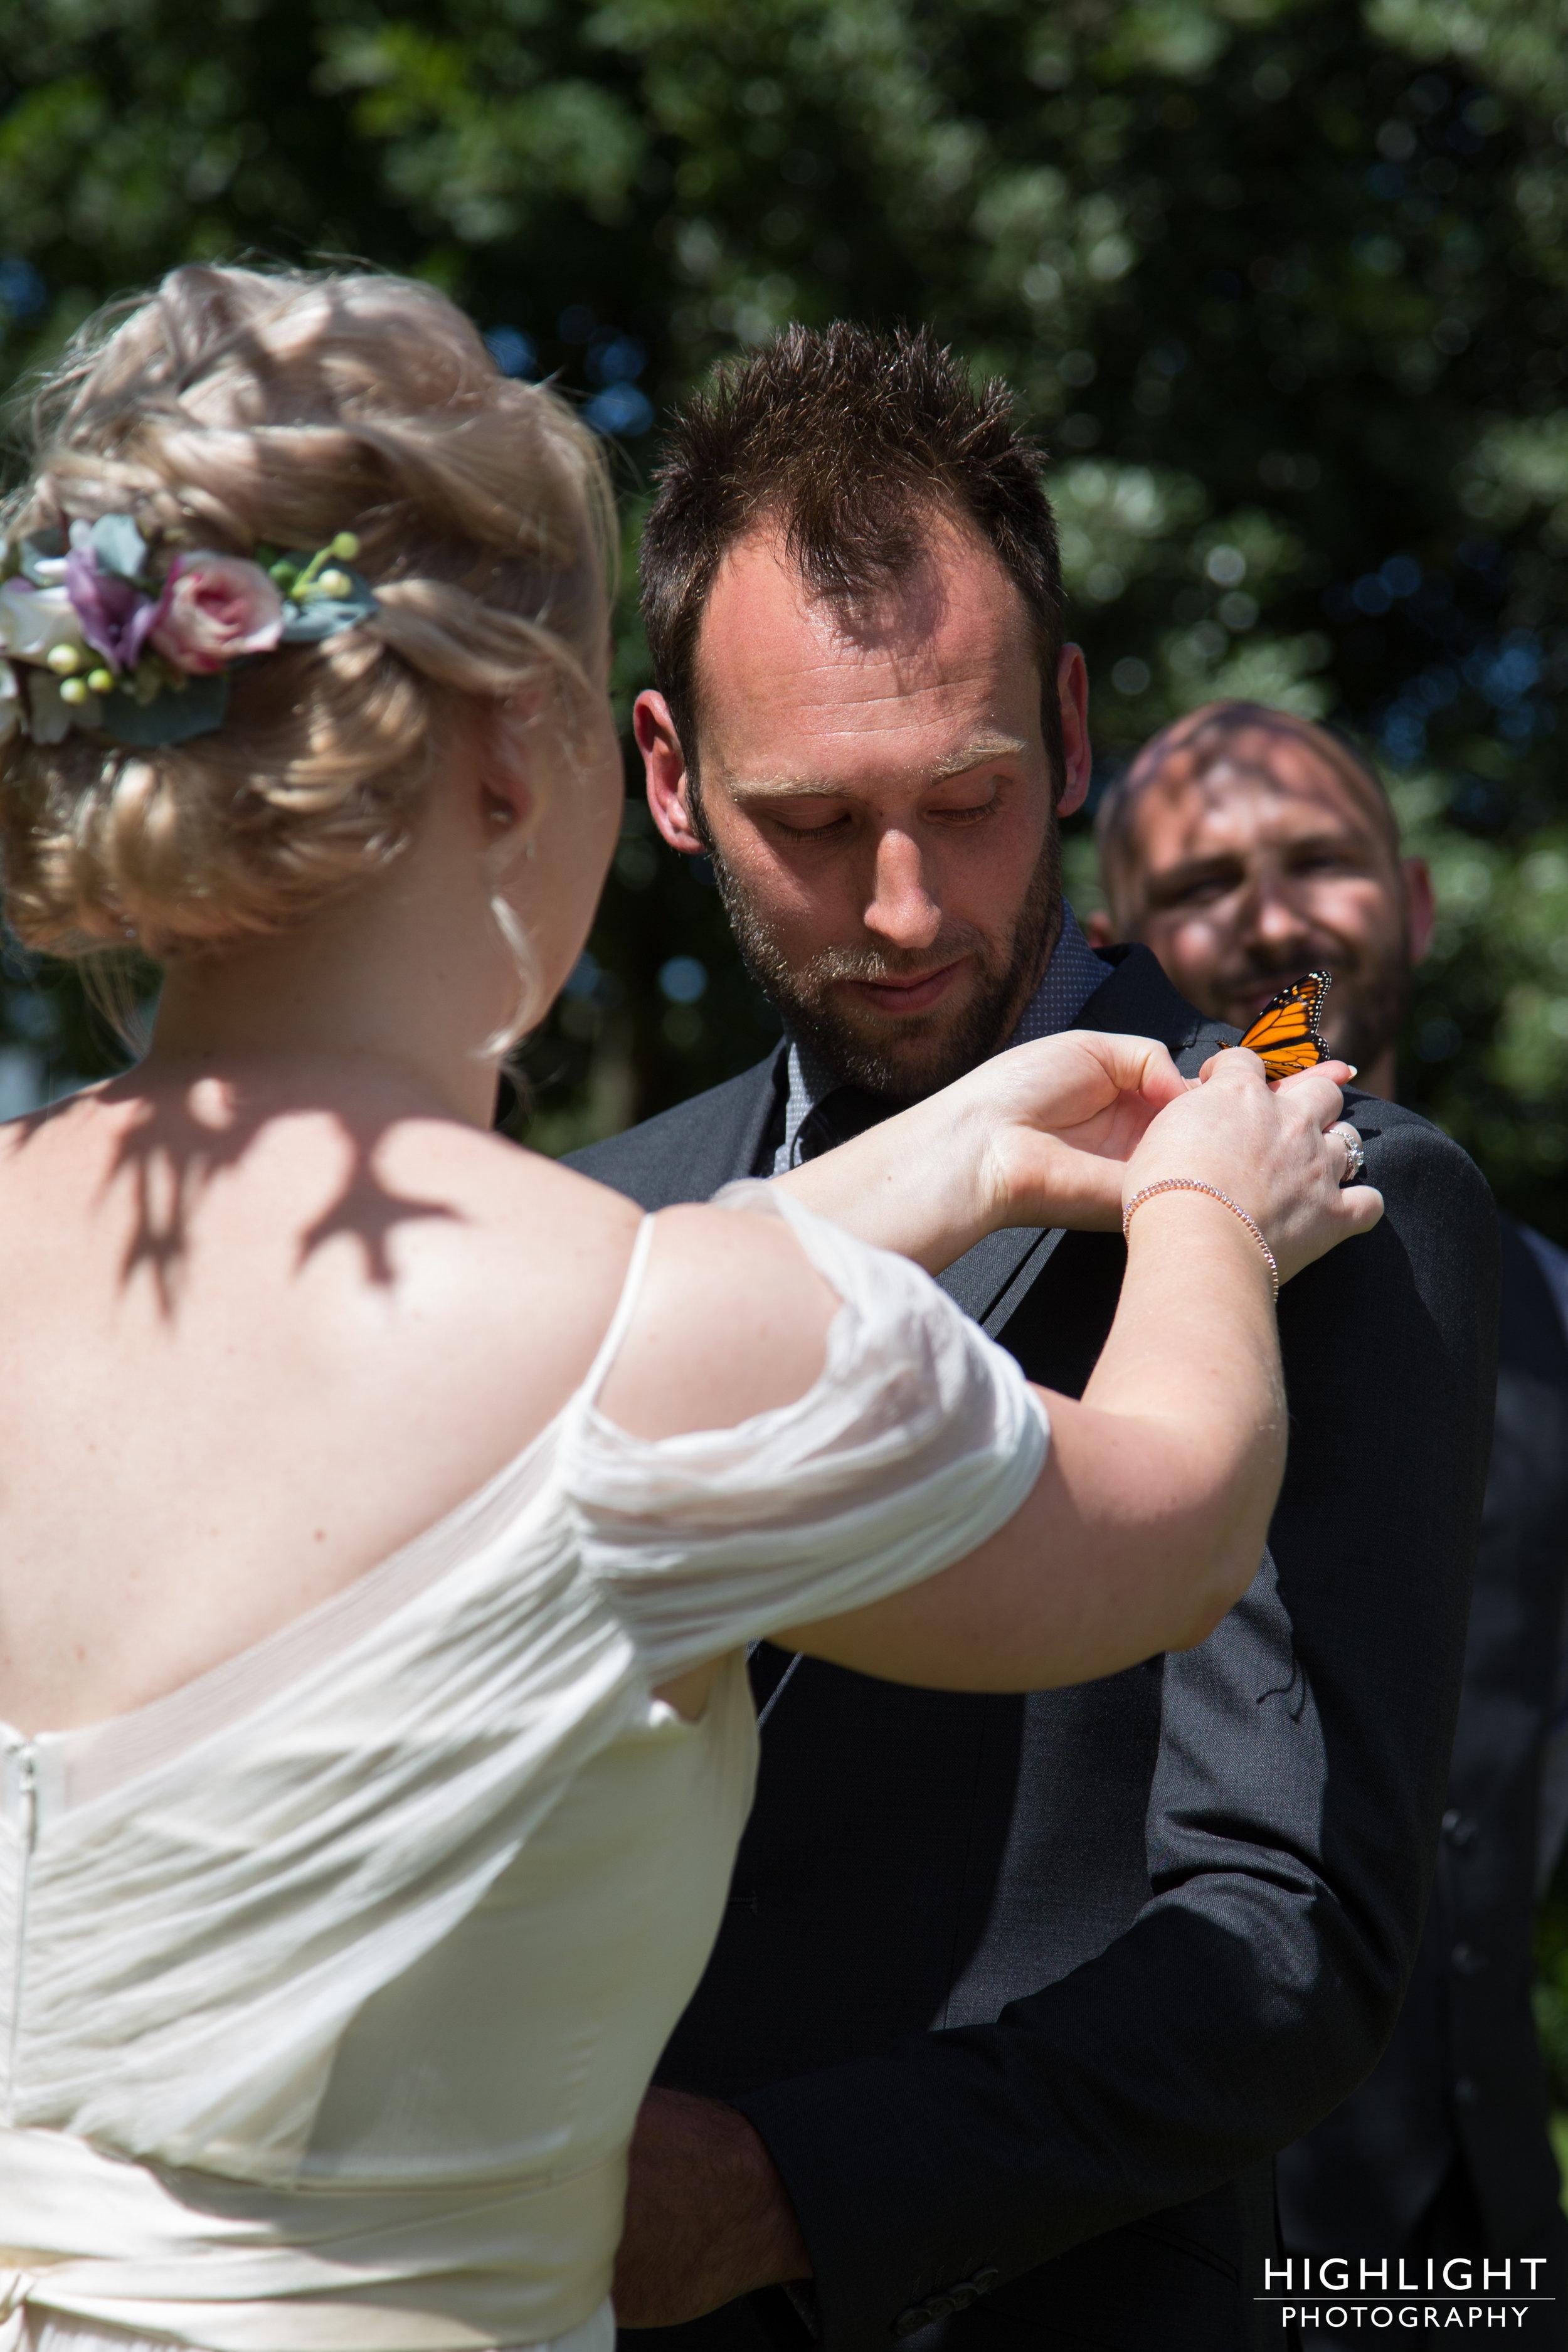 rose-johnny--butterfly-highlight-wedding-photography-palmerston-north-manawatu